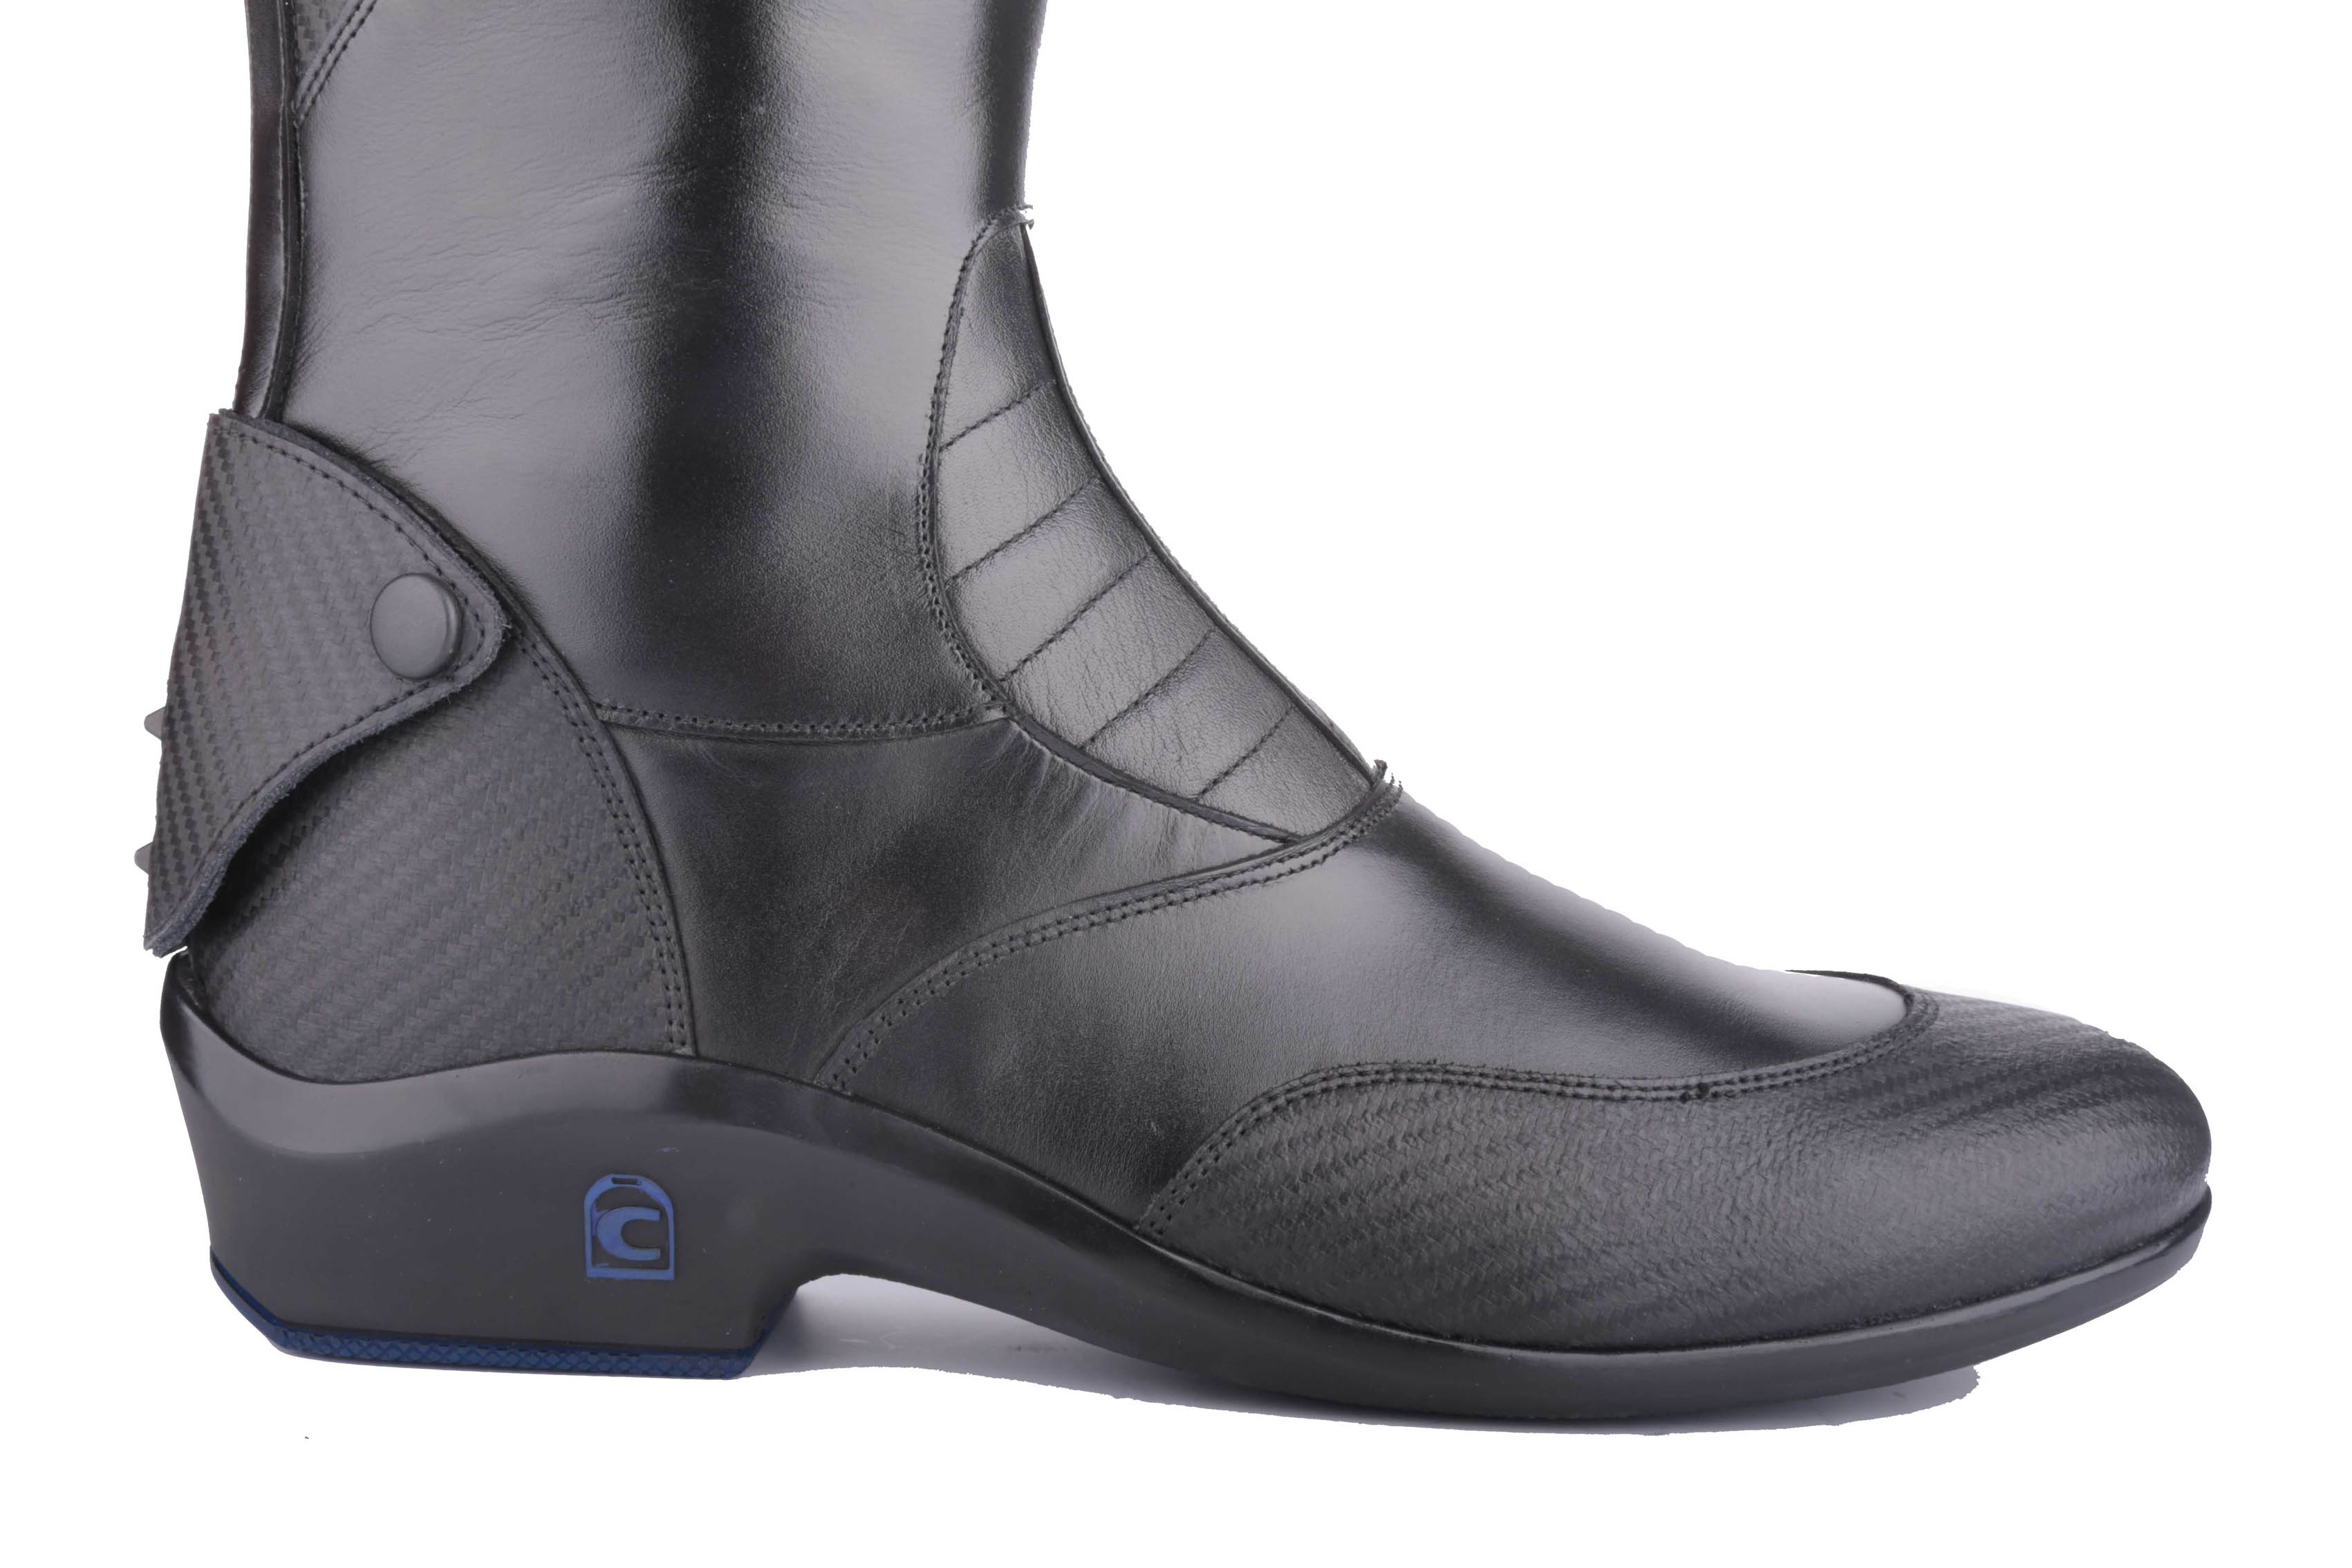 Reebok Herren Turnschuhe Royal Glide LX nqaakc3 Sneaker